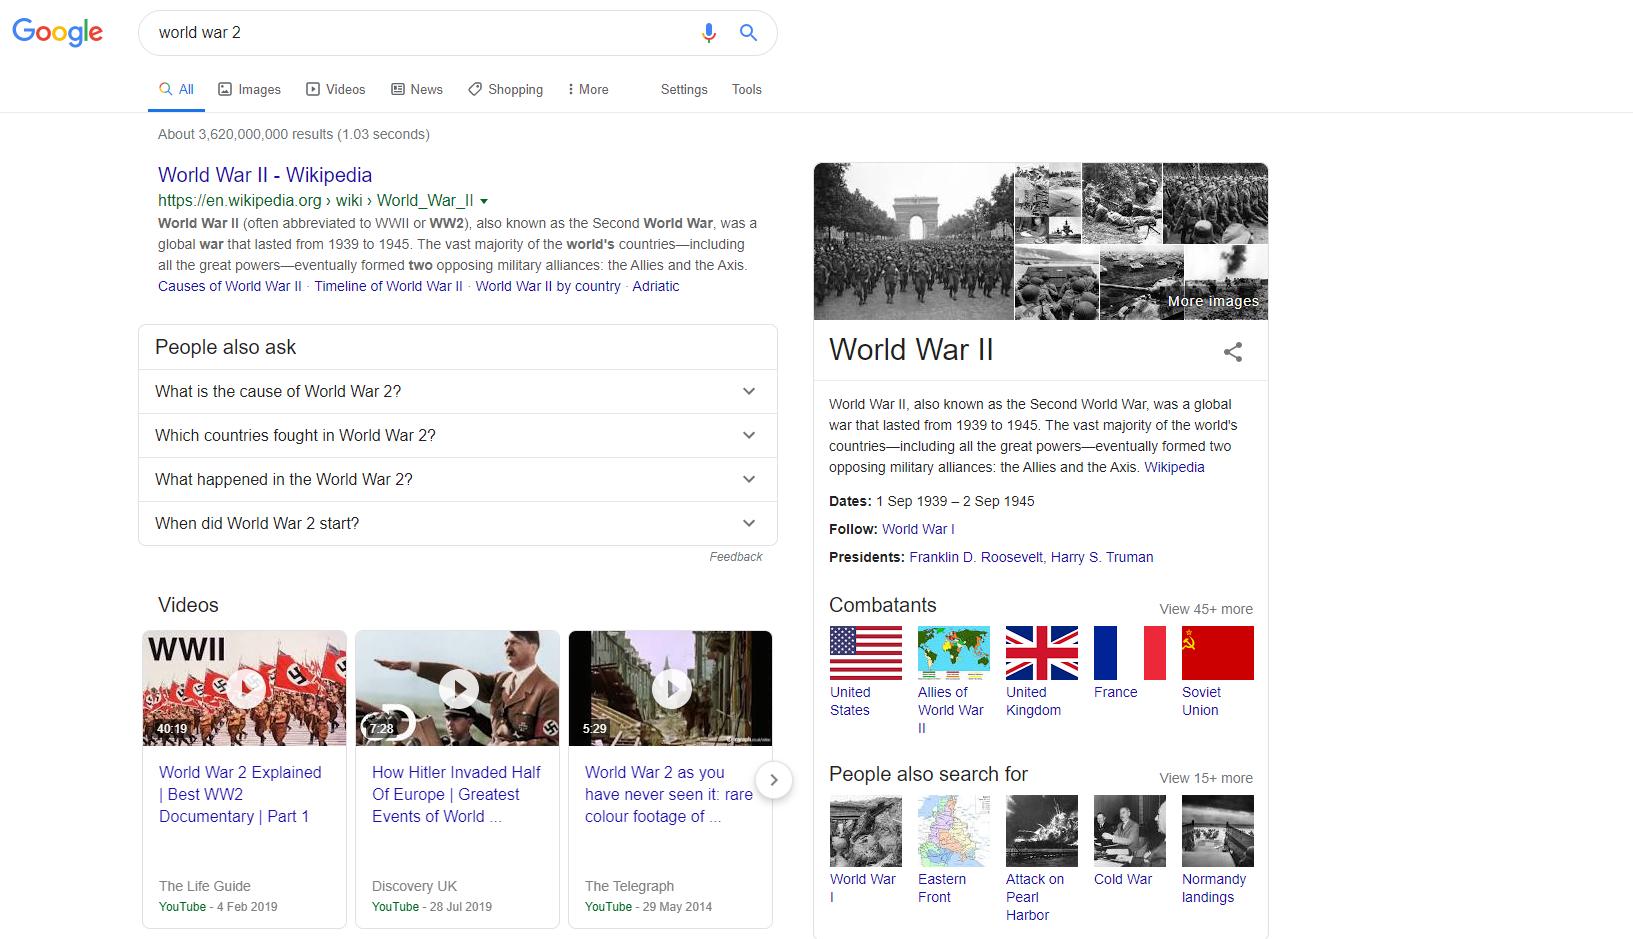 world war 2 - informational search